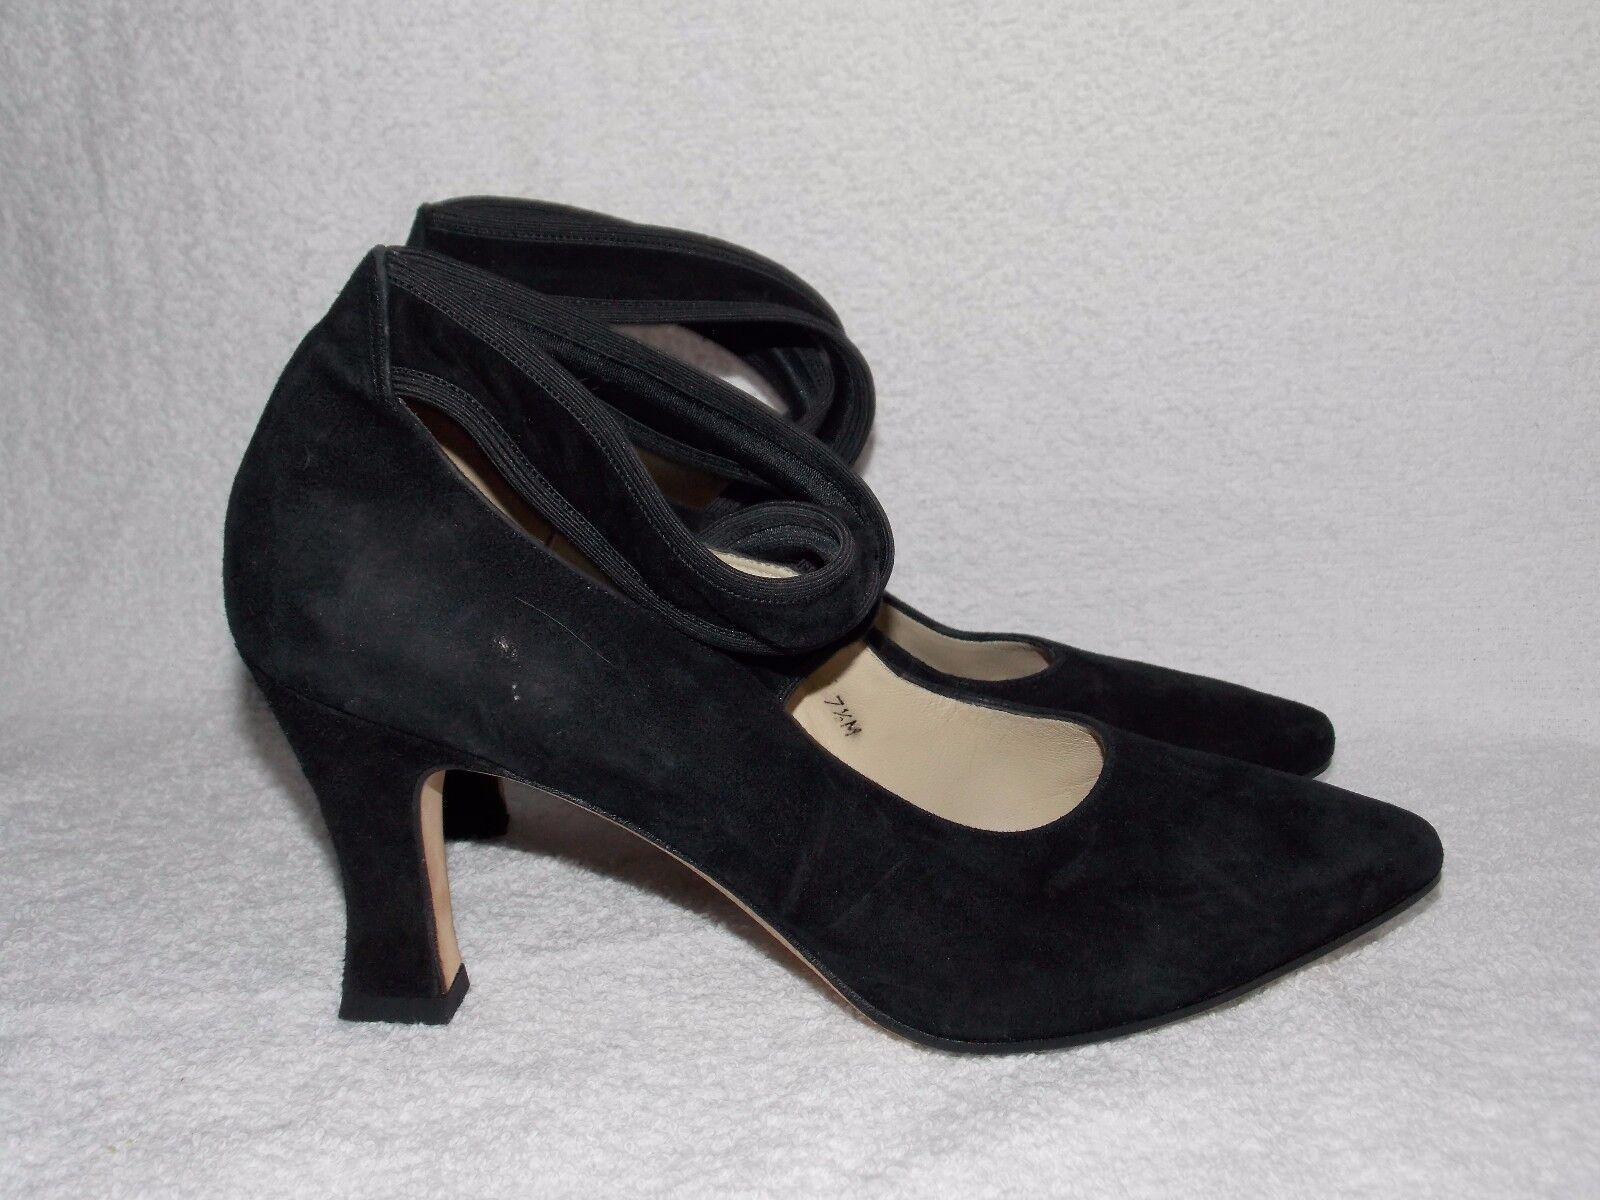 Larry Stuart Black Suede Heels CRISS CROSS Straps Slip On Heels 7.5M Used